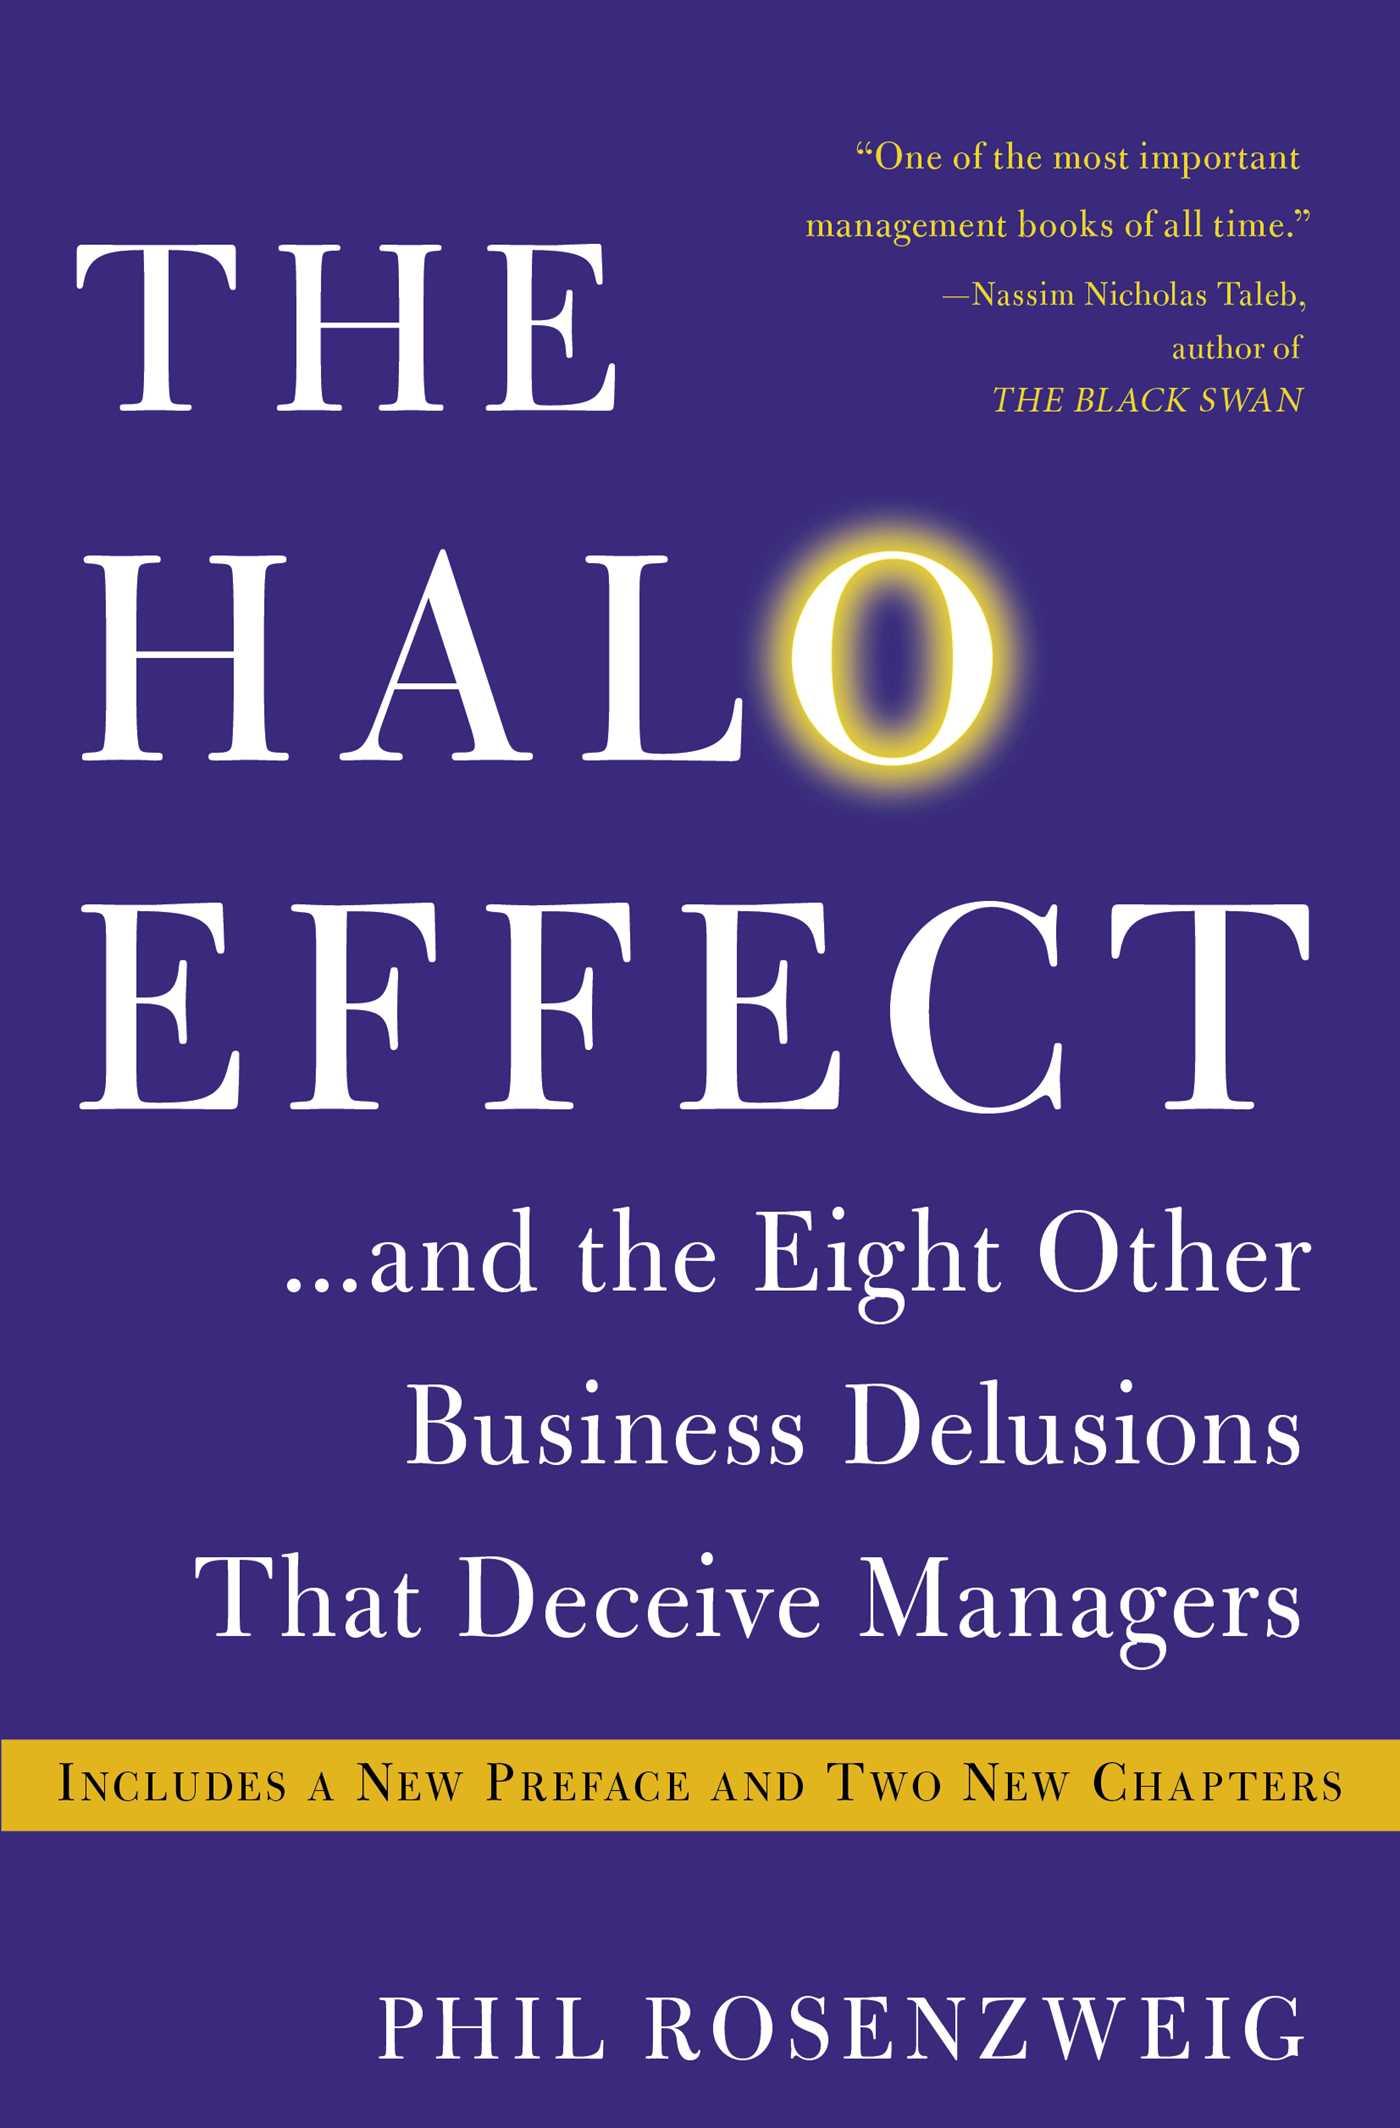 Halo effect 9781416538585 hr